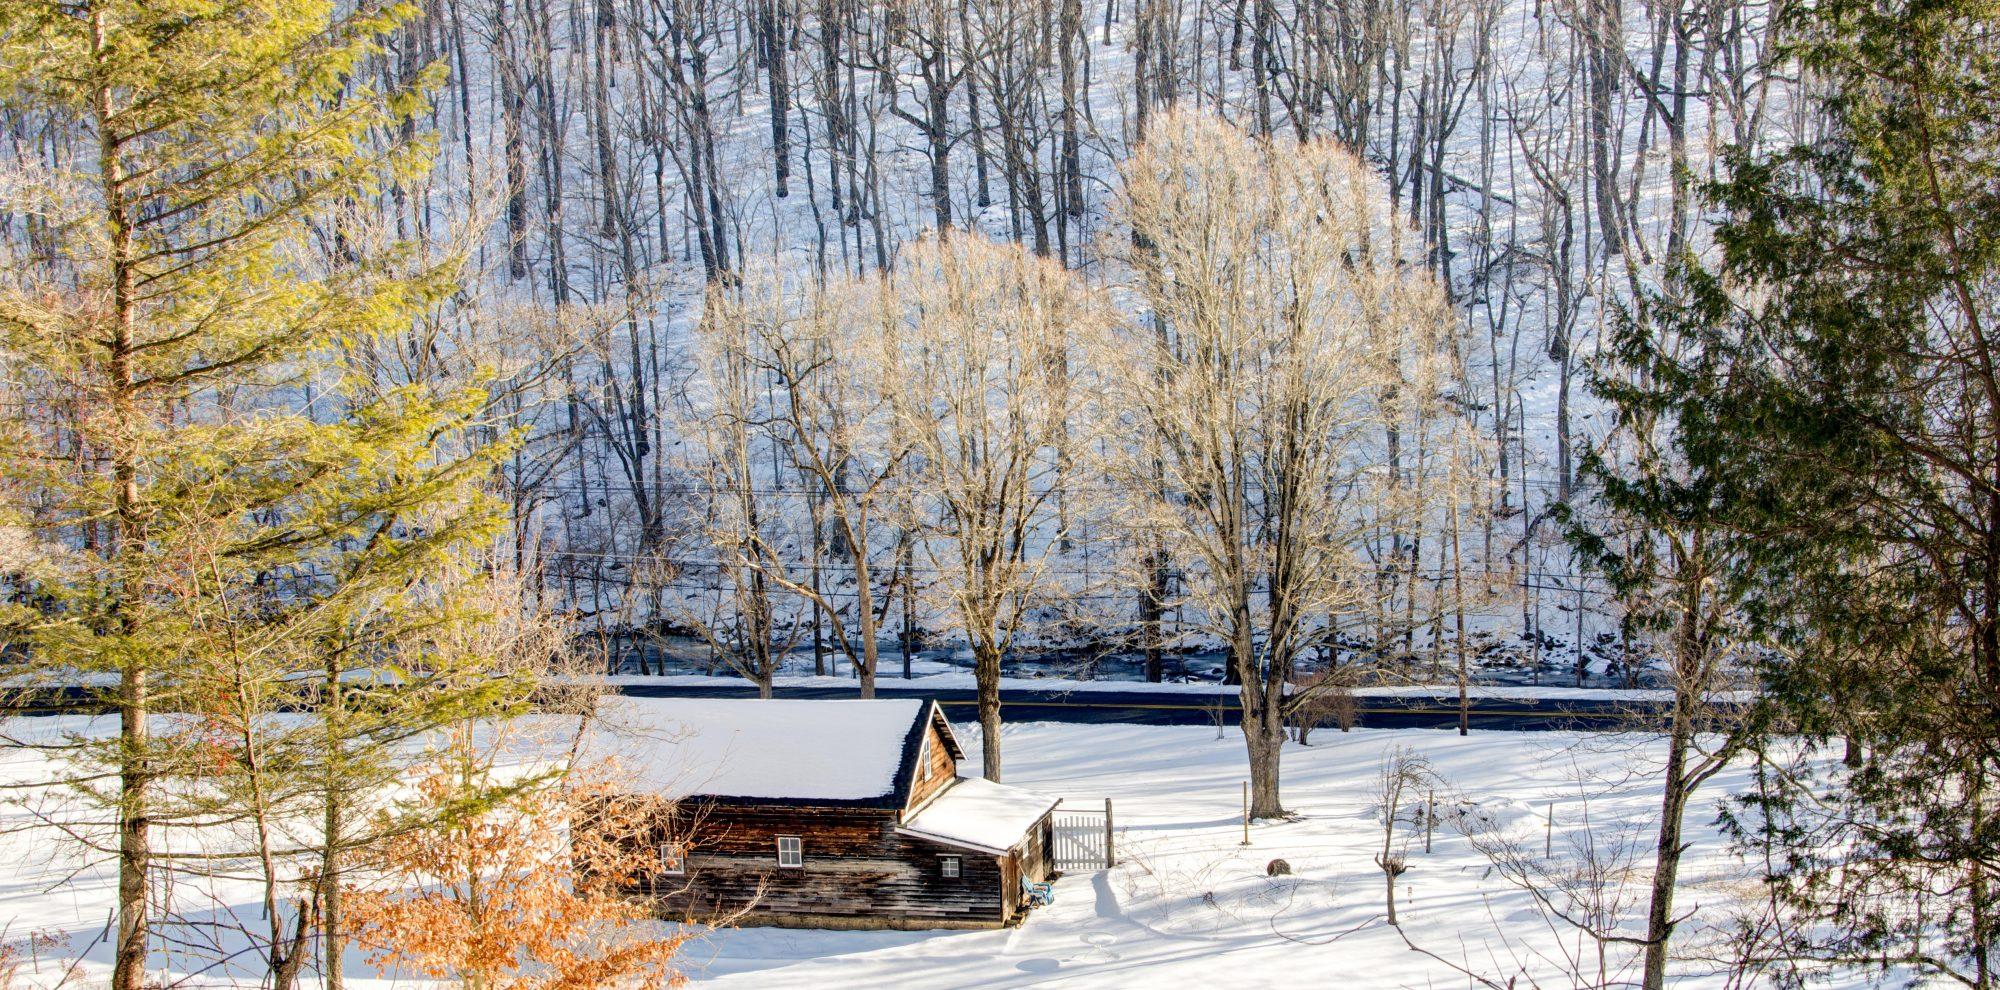 Snowy landscape - Photo by Khurt Williams - Unsplash